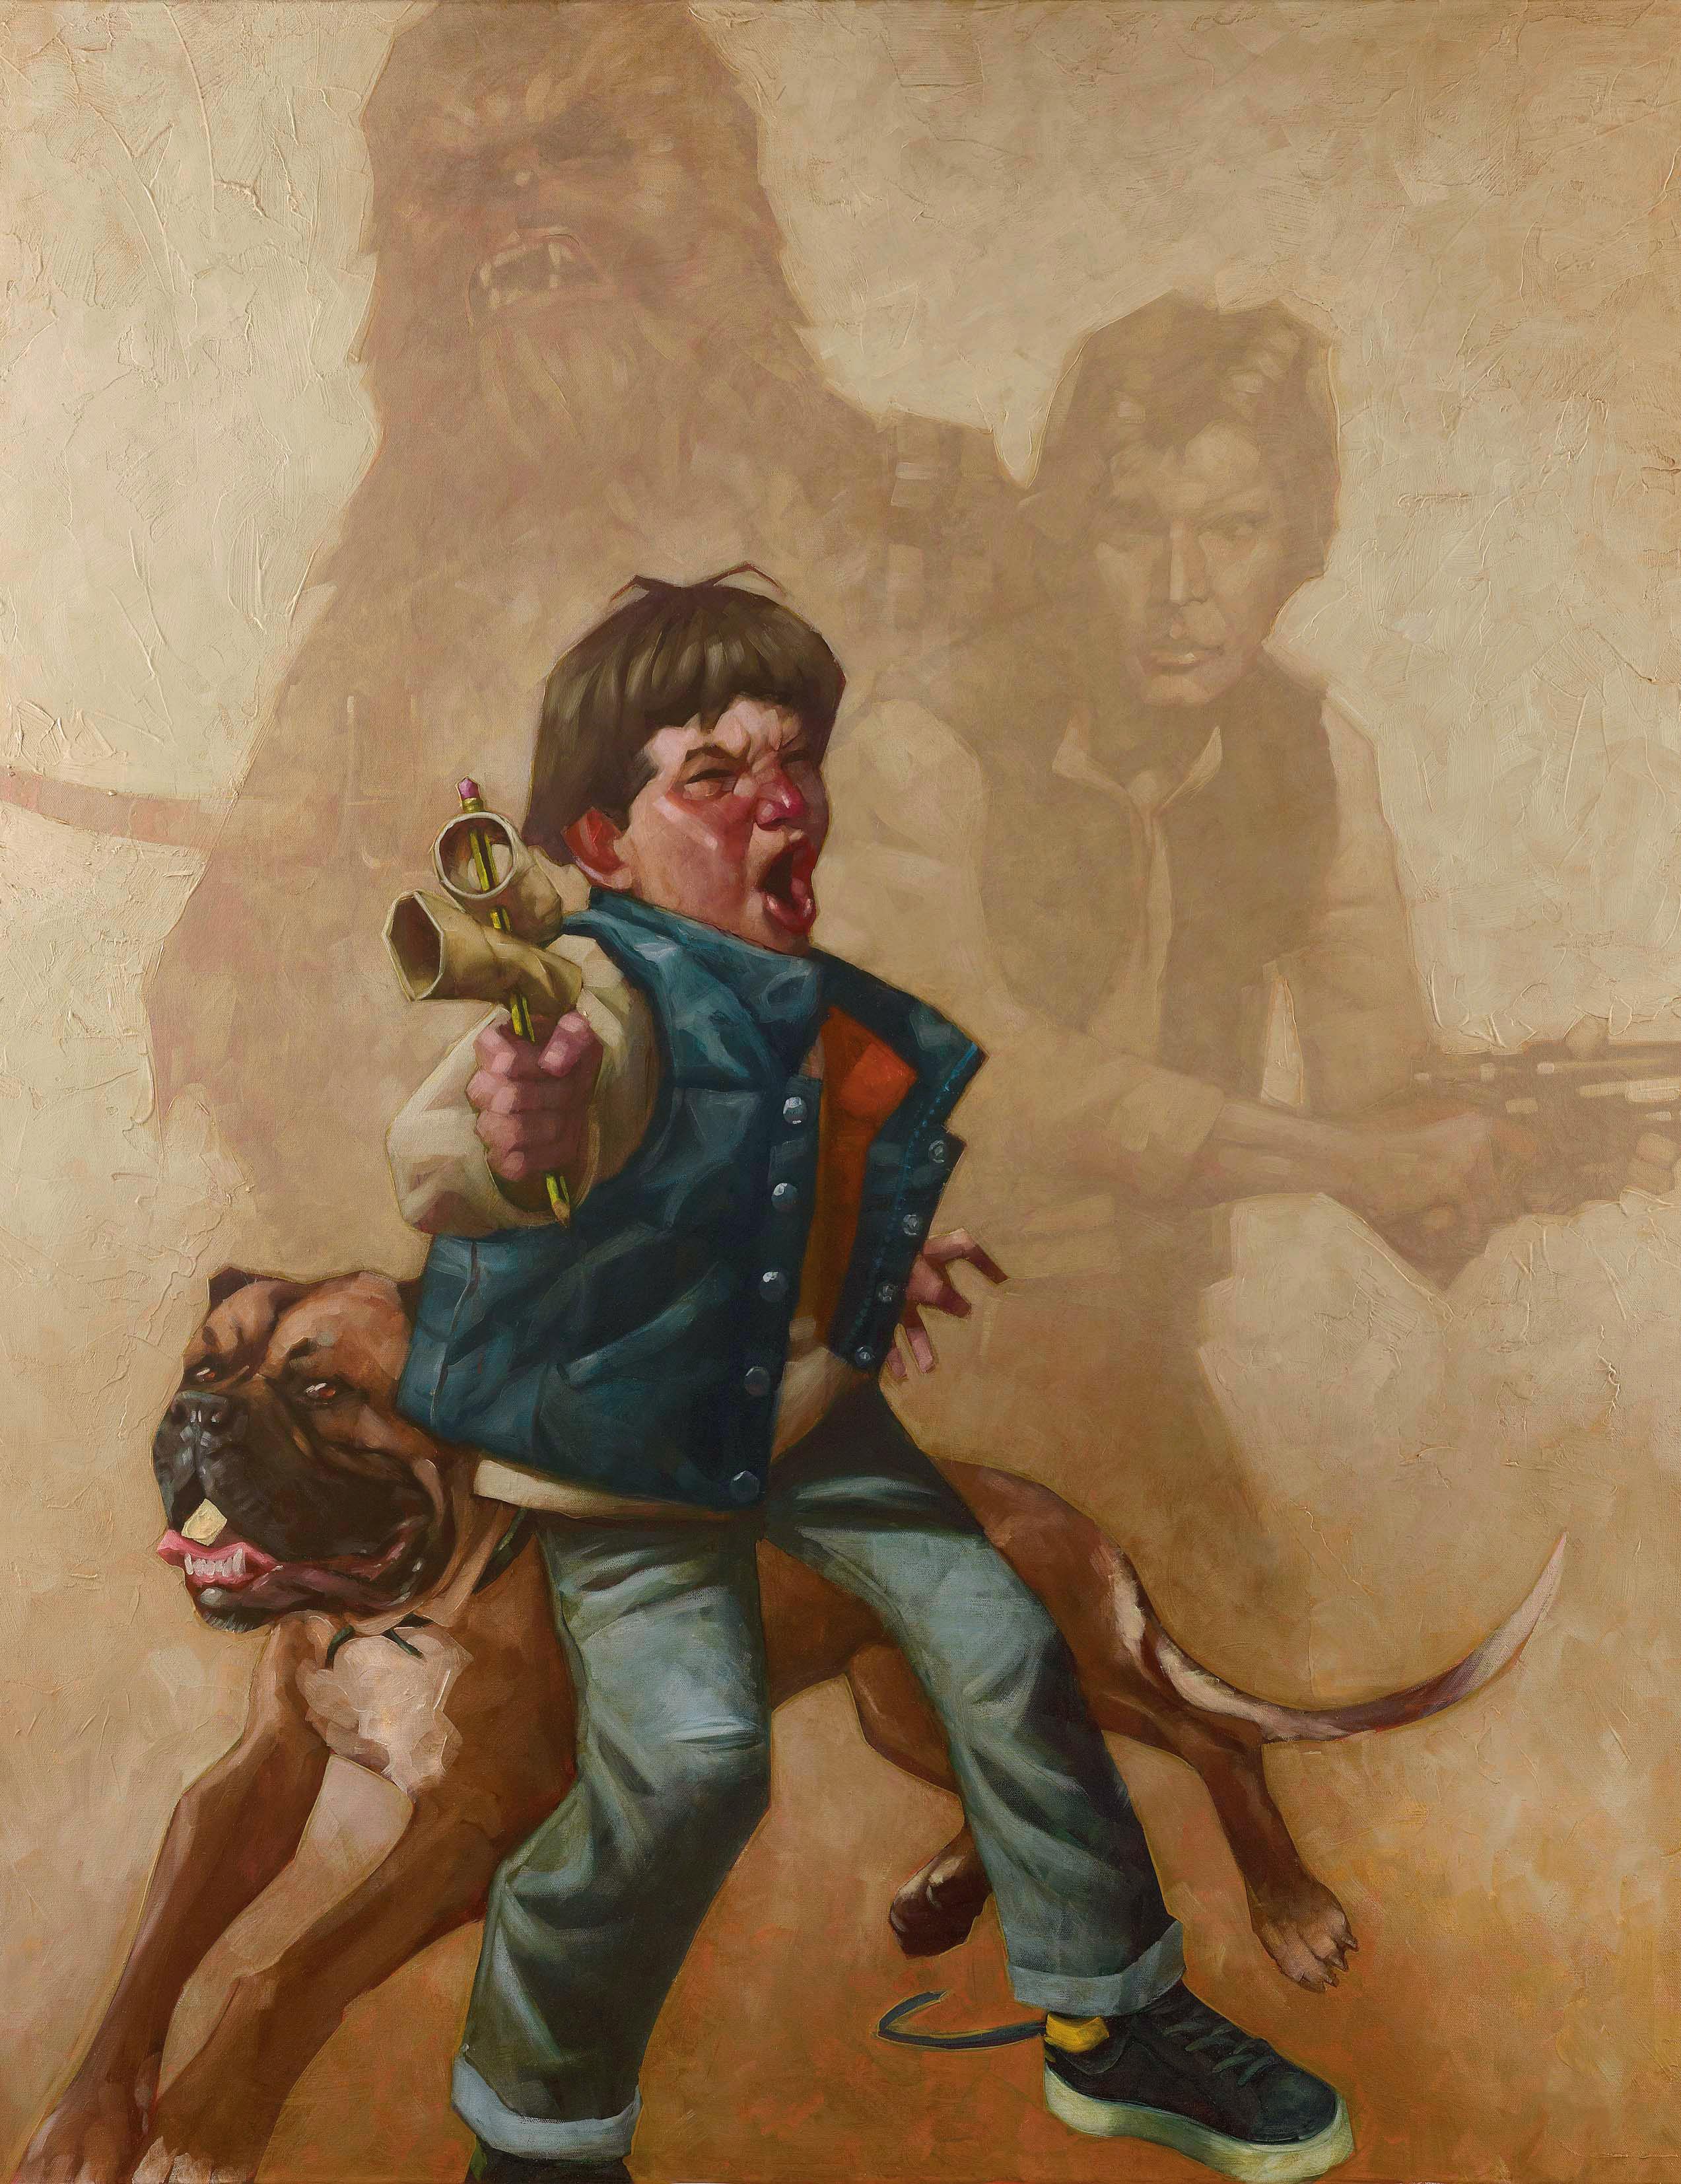 Craig Davison - Star Wars Paintings | Collater.al